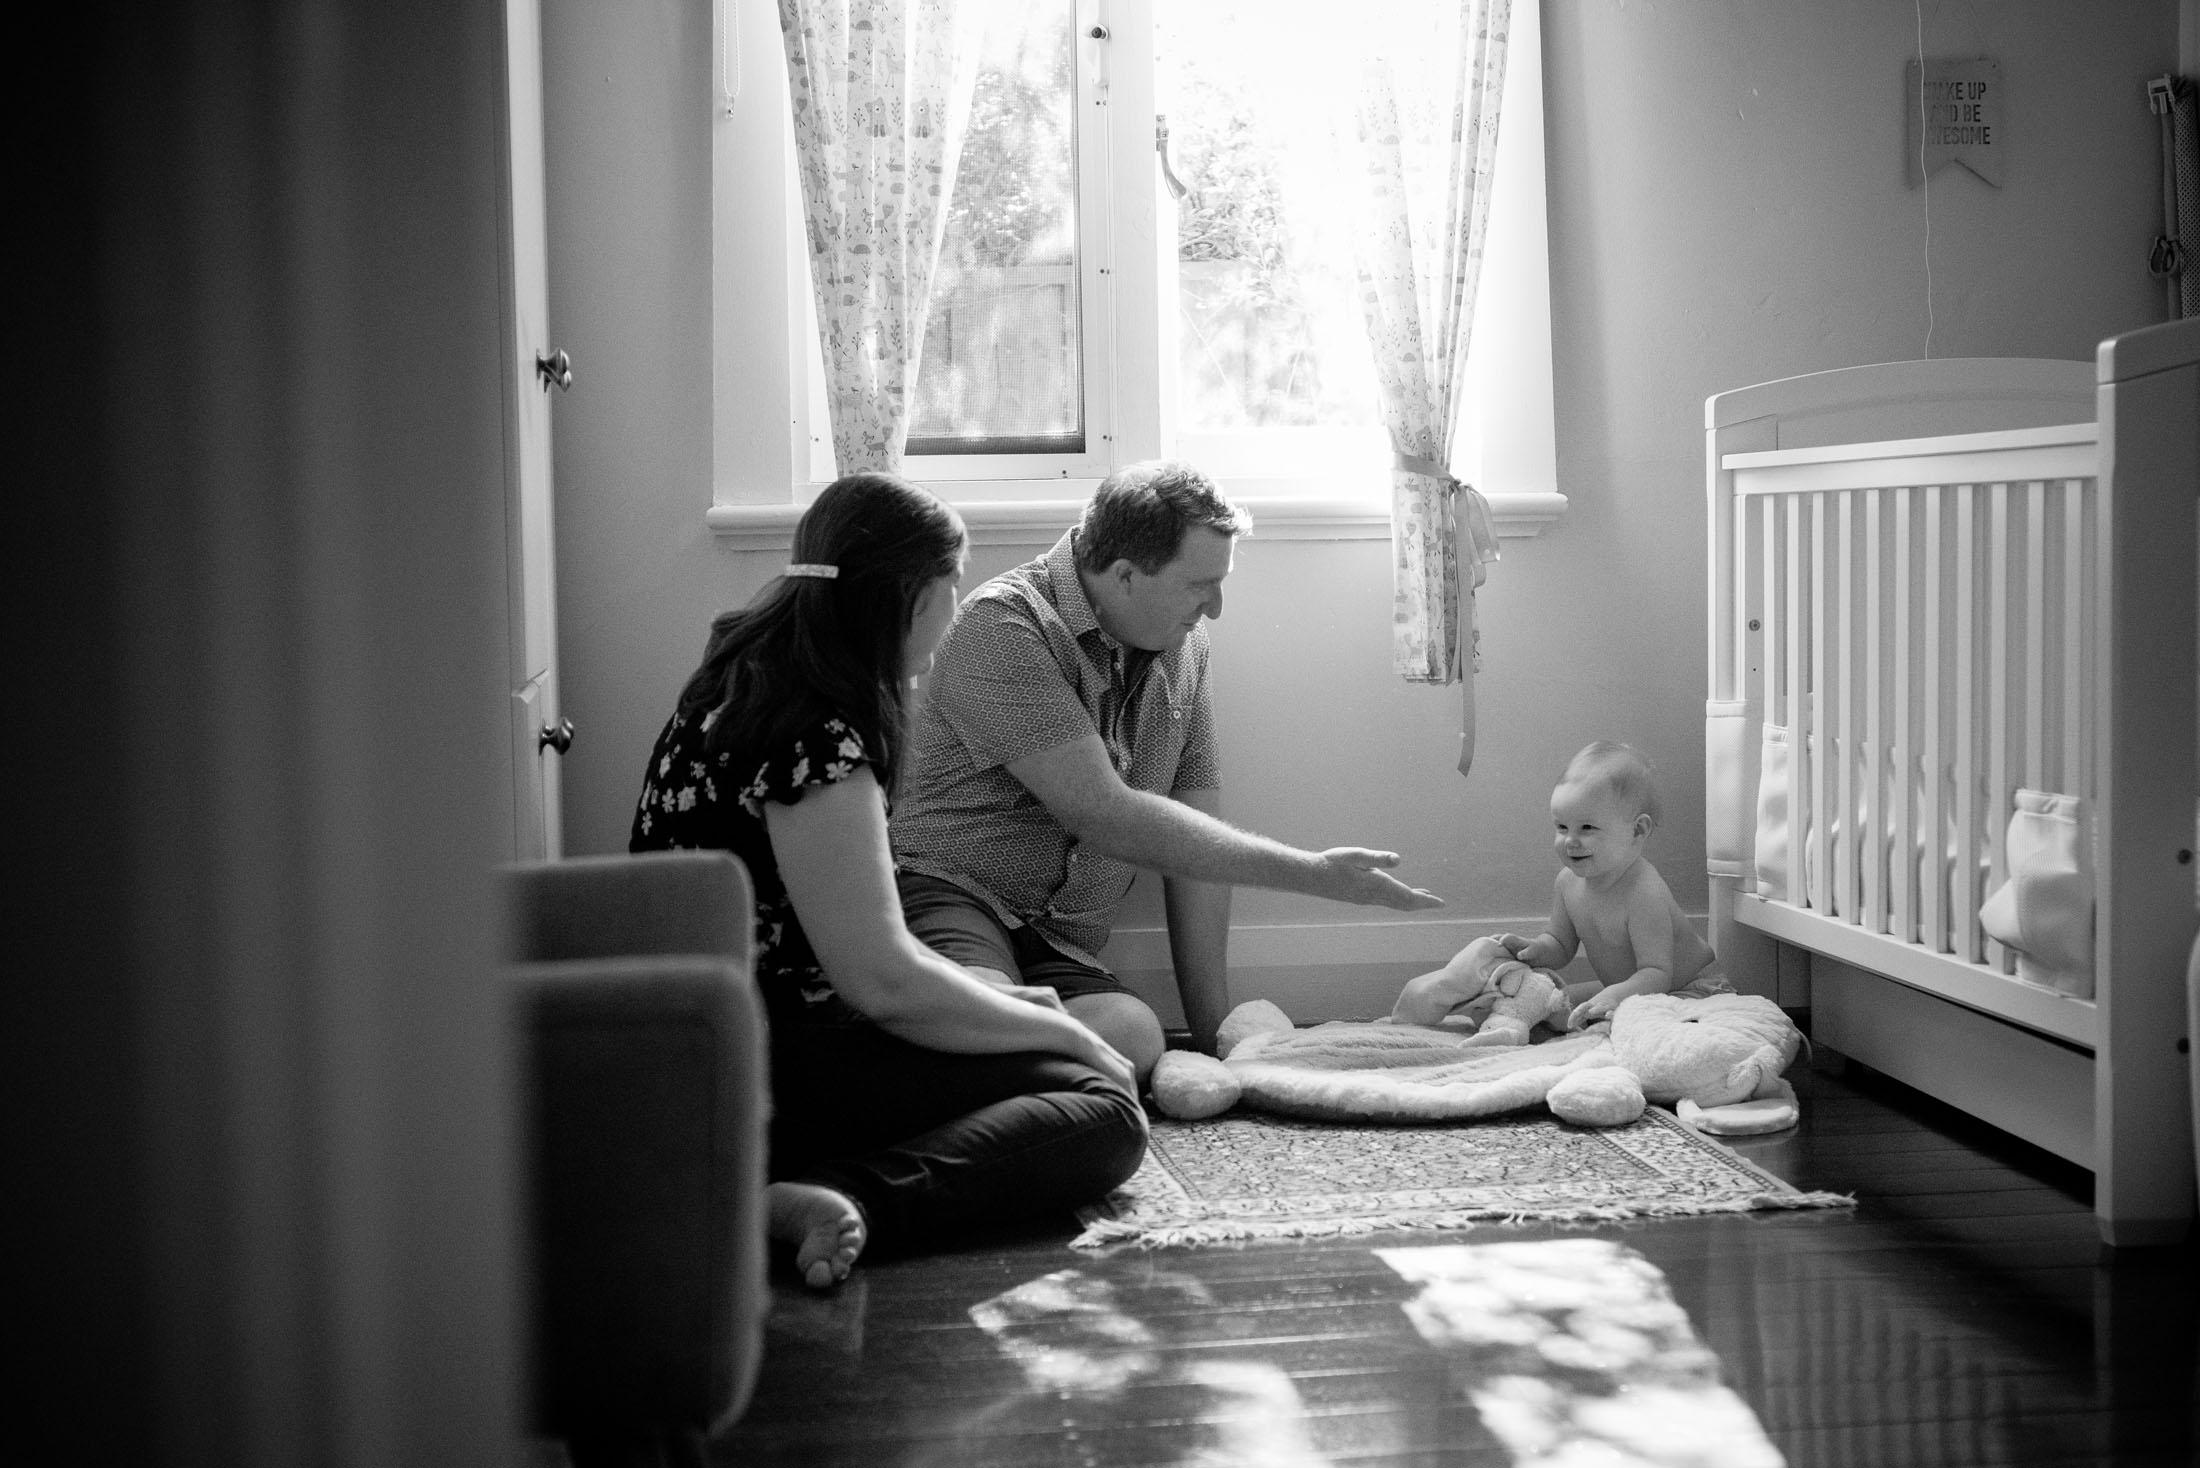 Allen_Family-Photography-unposed03.JPG